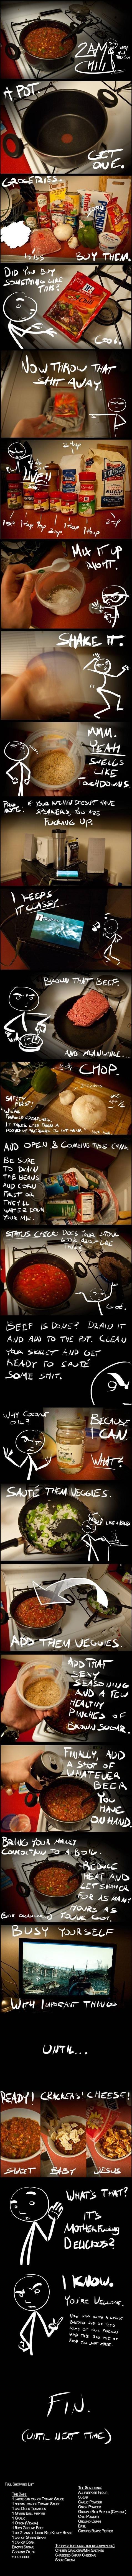 Recipe for the best chili you ever had.. Recipe for the best chili you will ever eat.. C chics Saw mu' Bet? Am Ballistic . H kkg: igu 2 mm; ass mm A ND omen 2 c